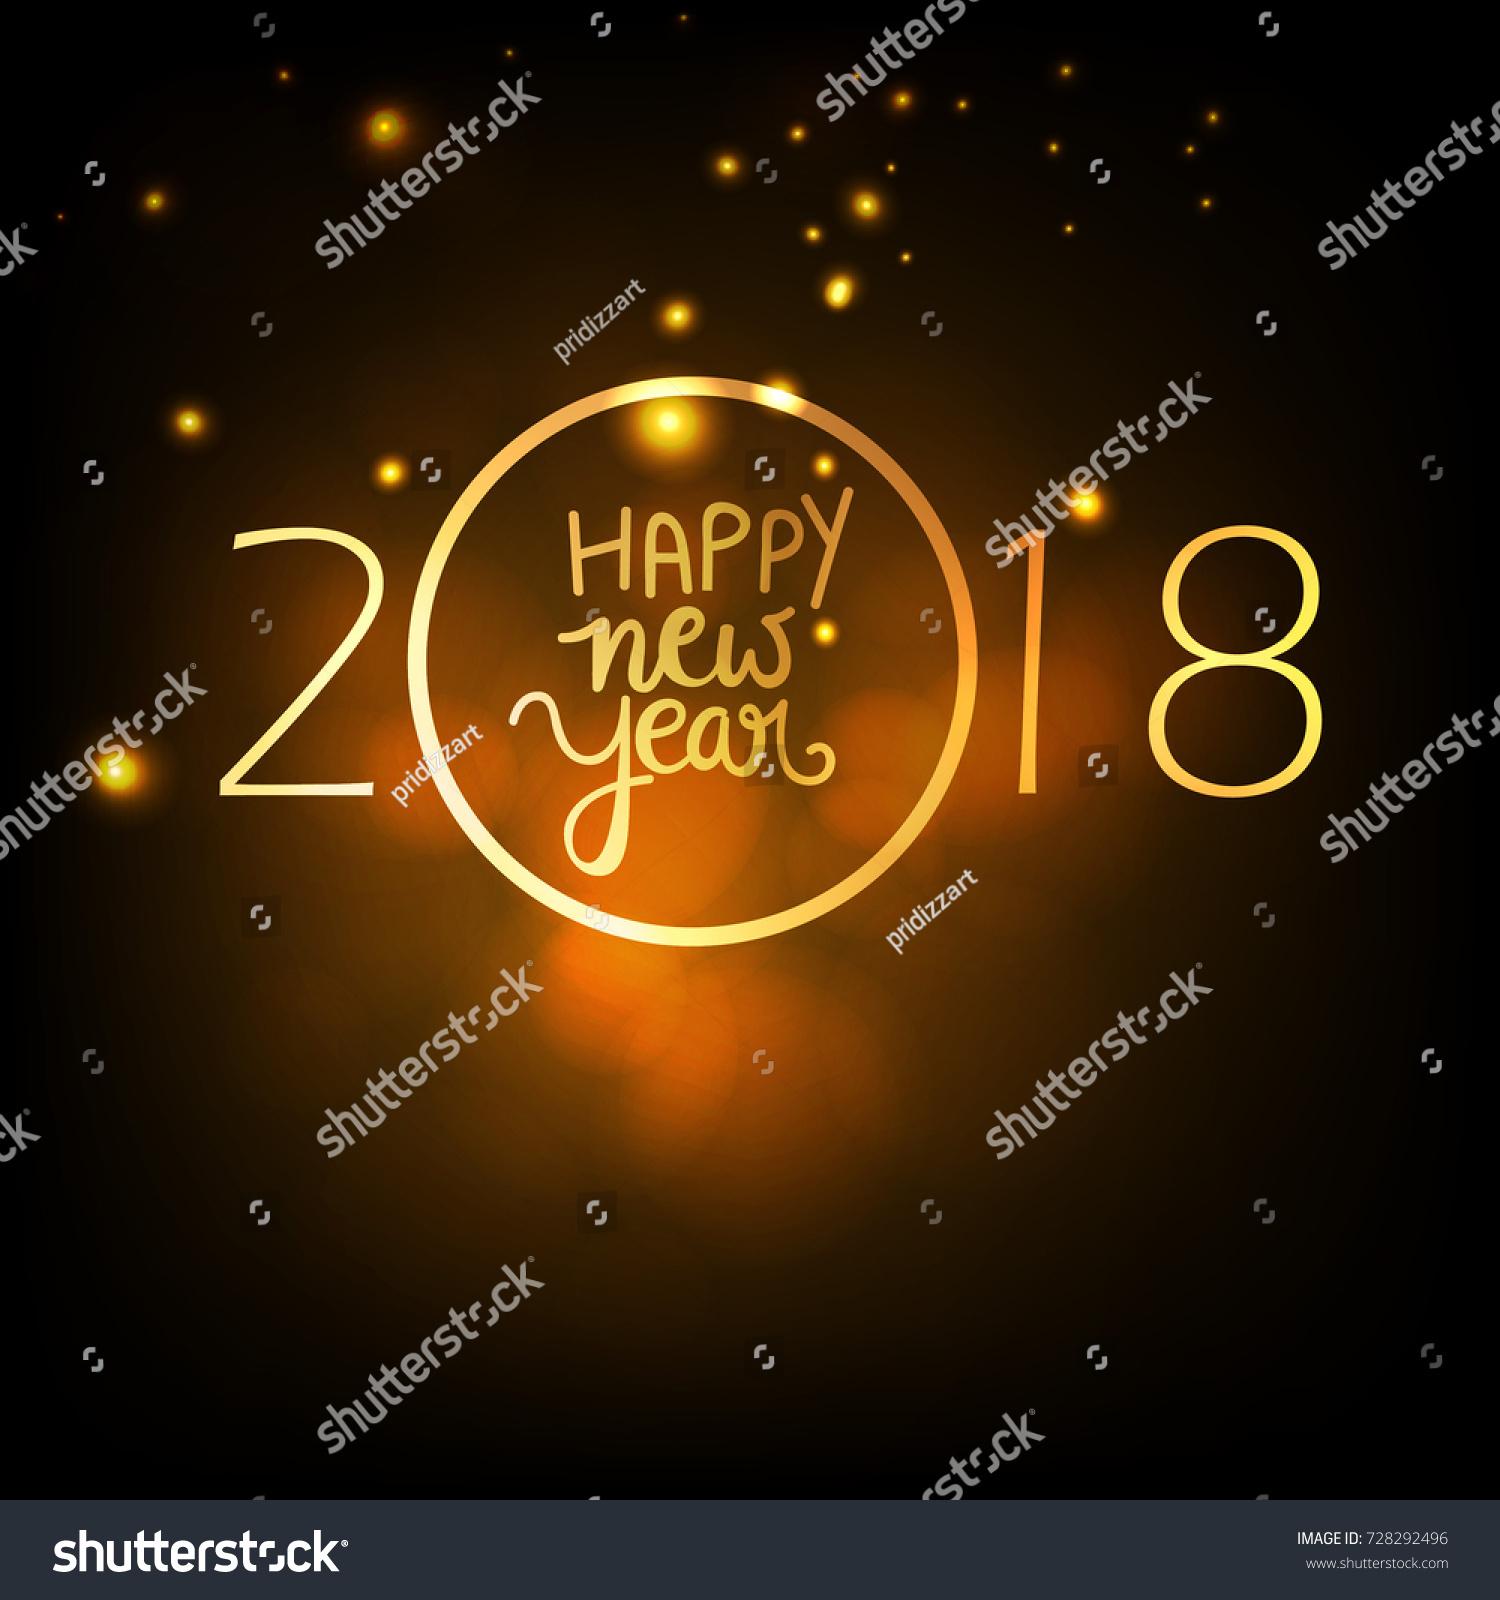 Happy New Year Wallpaper Design 728292496